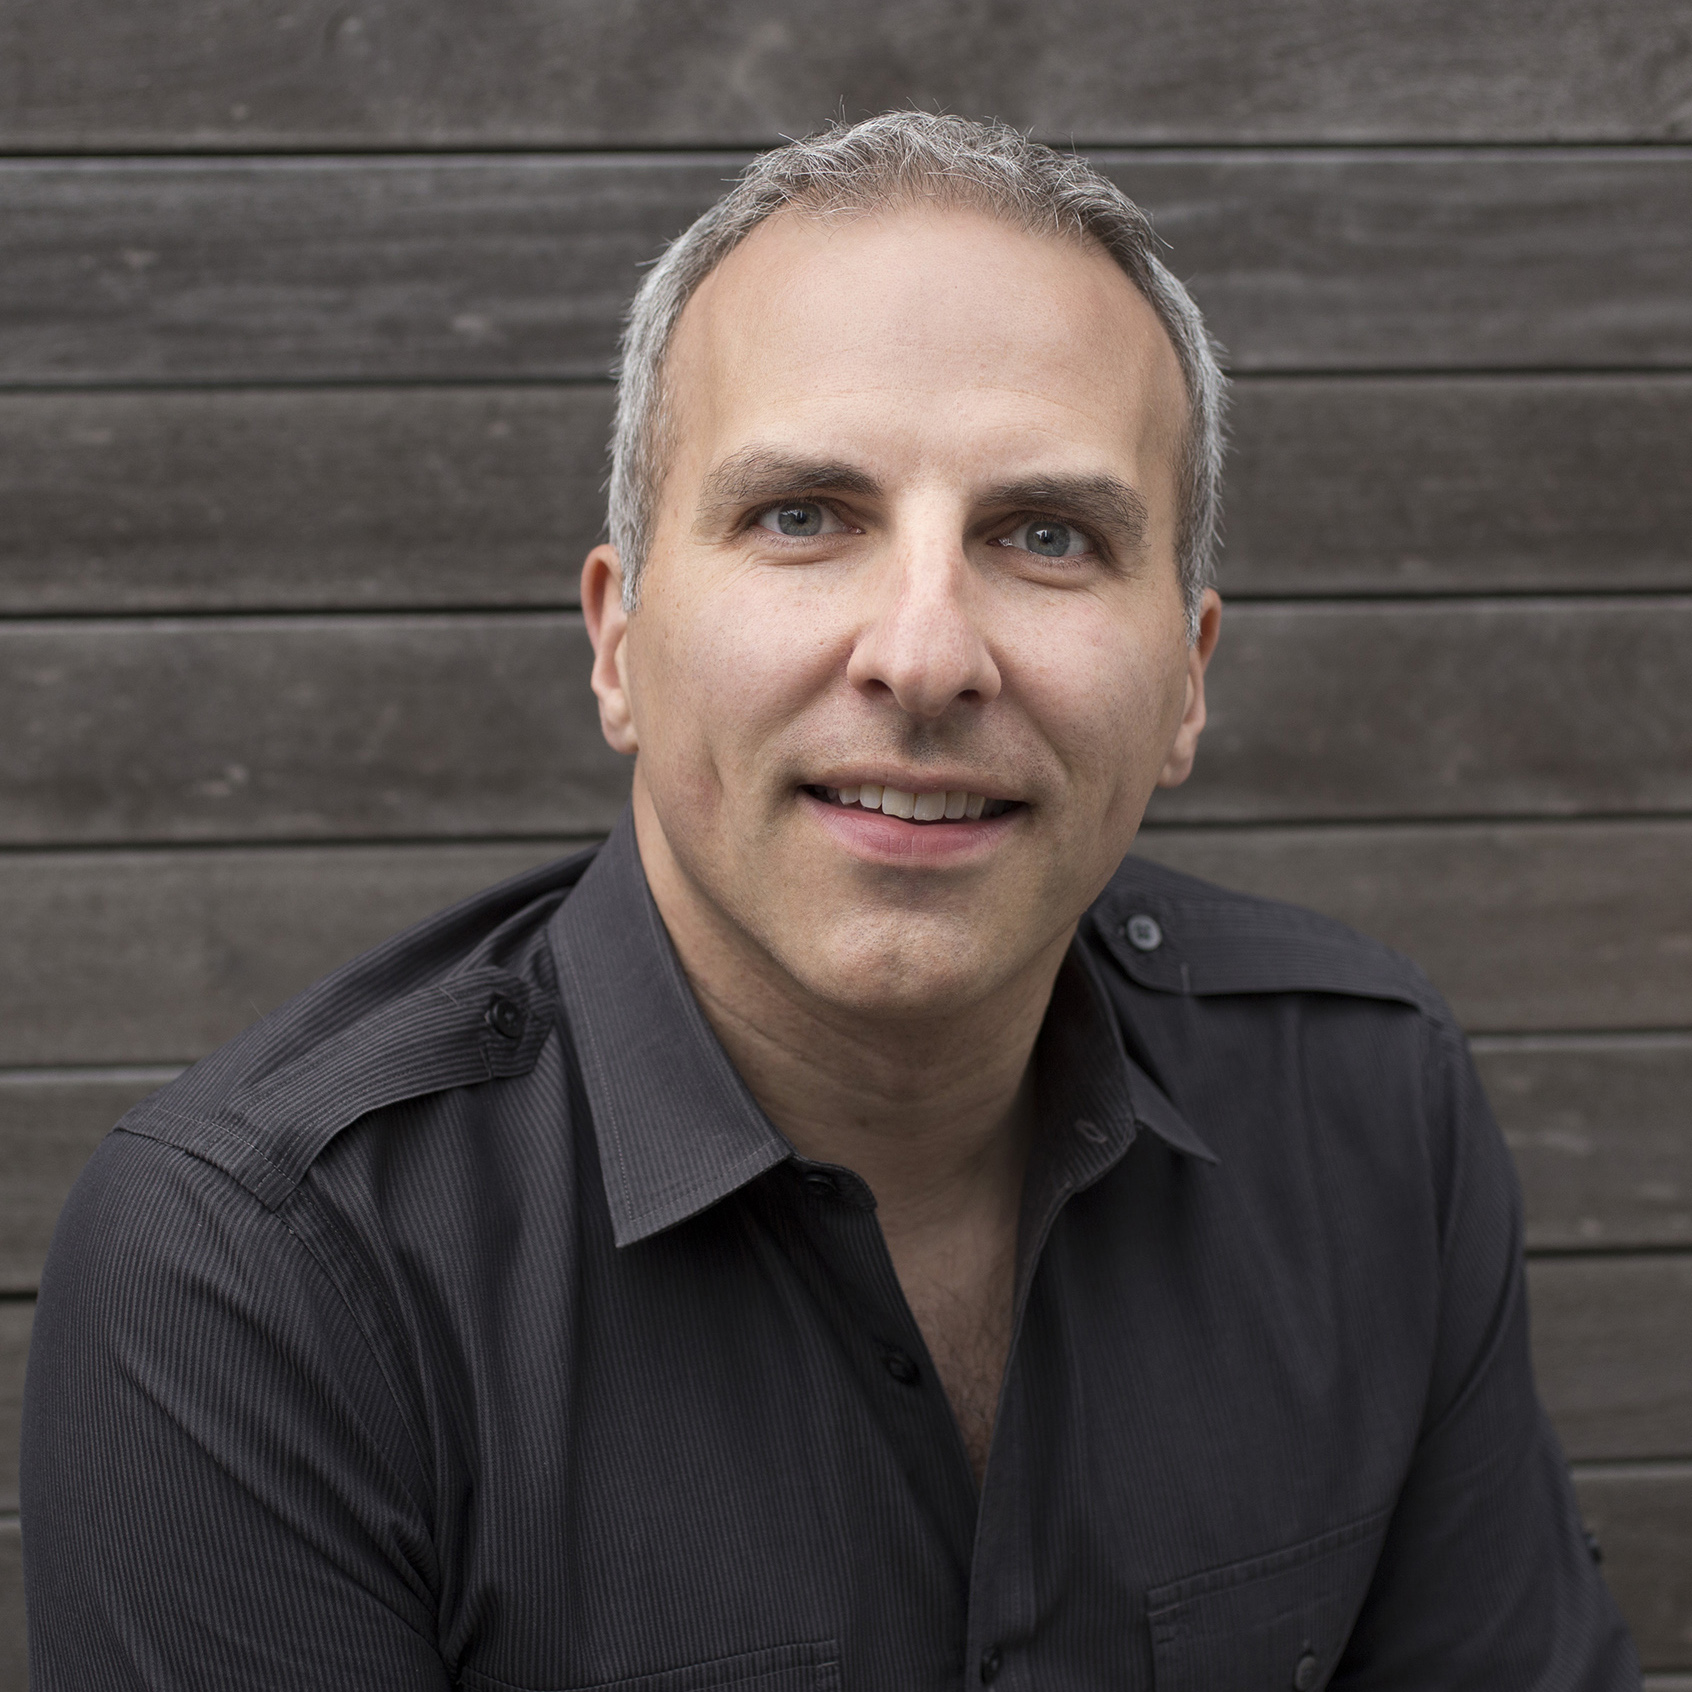 Ben Ahroni - CEO & Co-founderhttp://plaza.dsolver.ca/m/benahroni